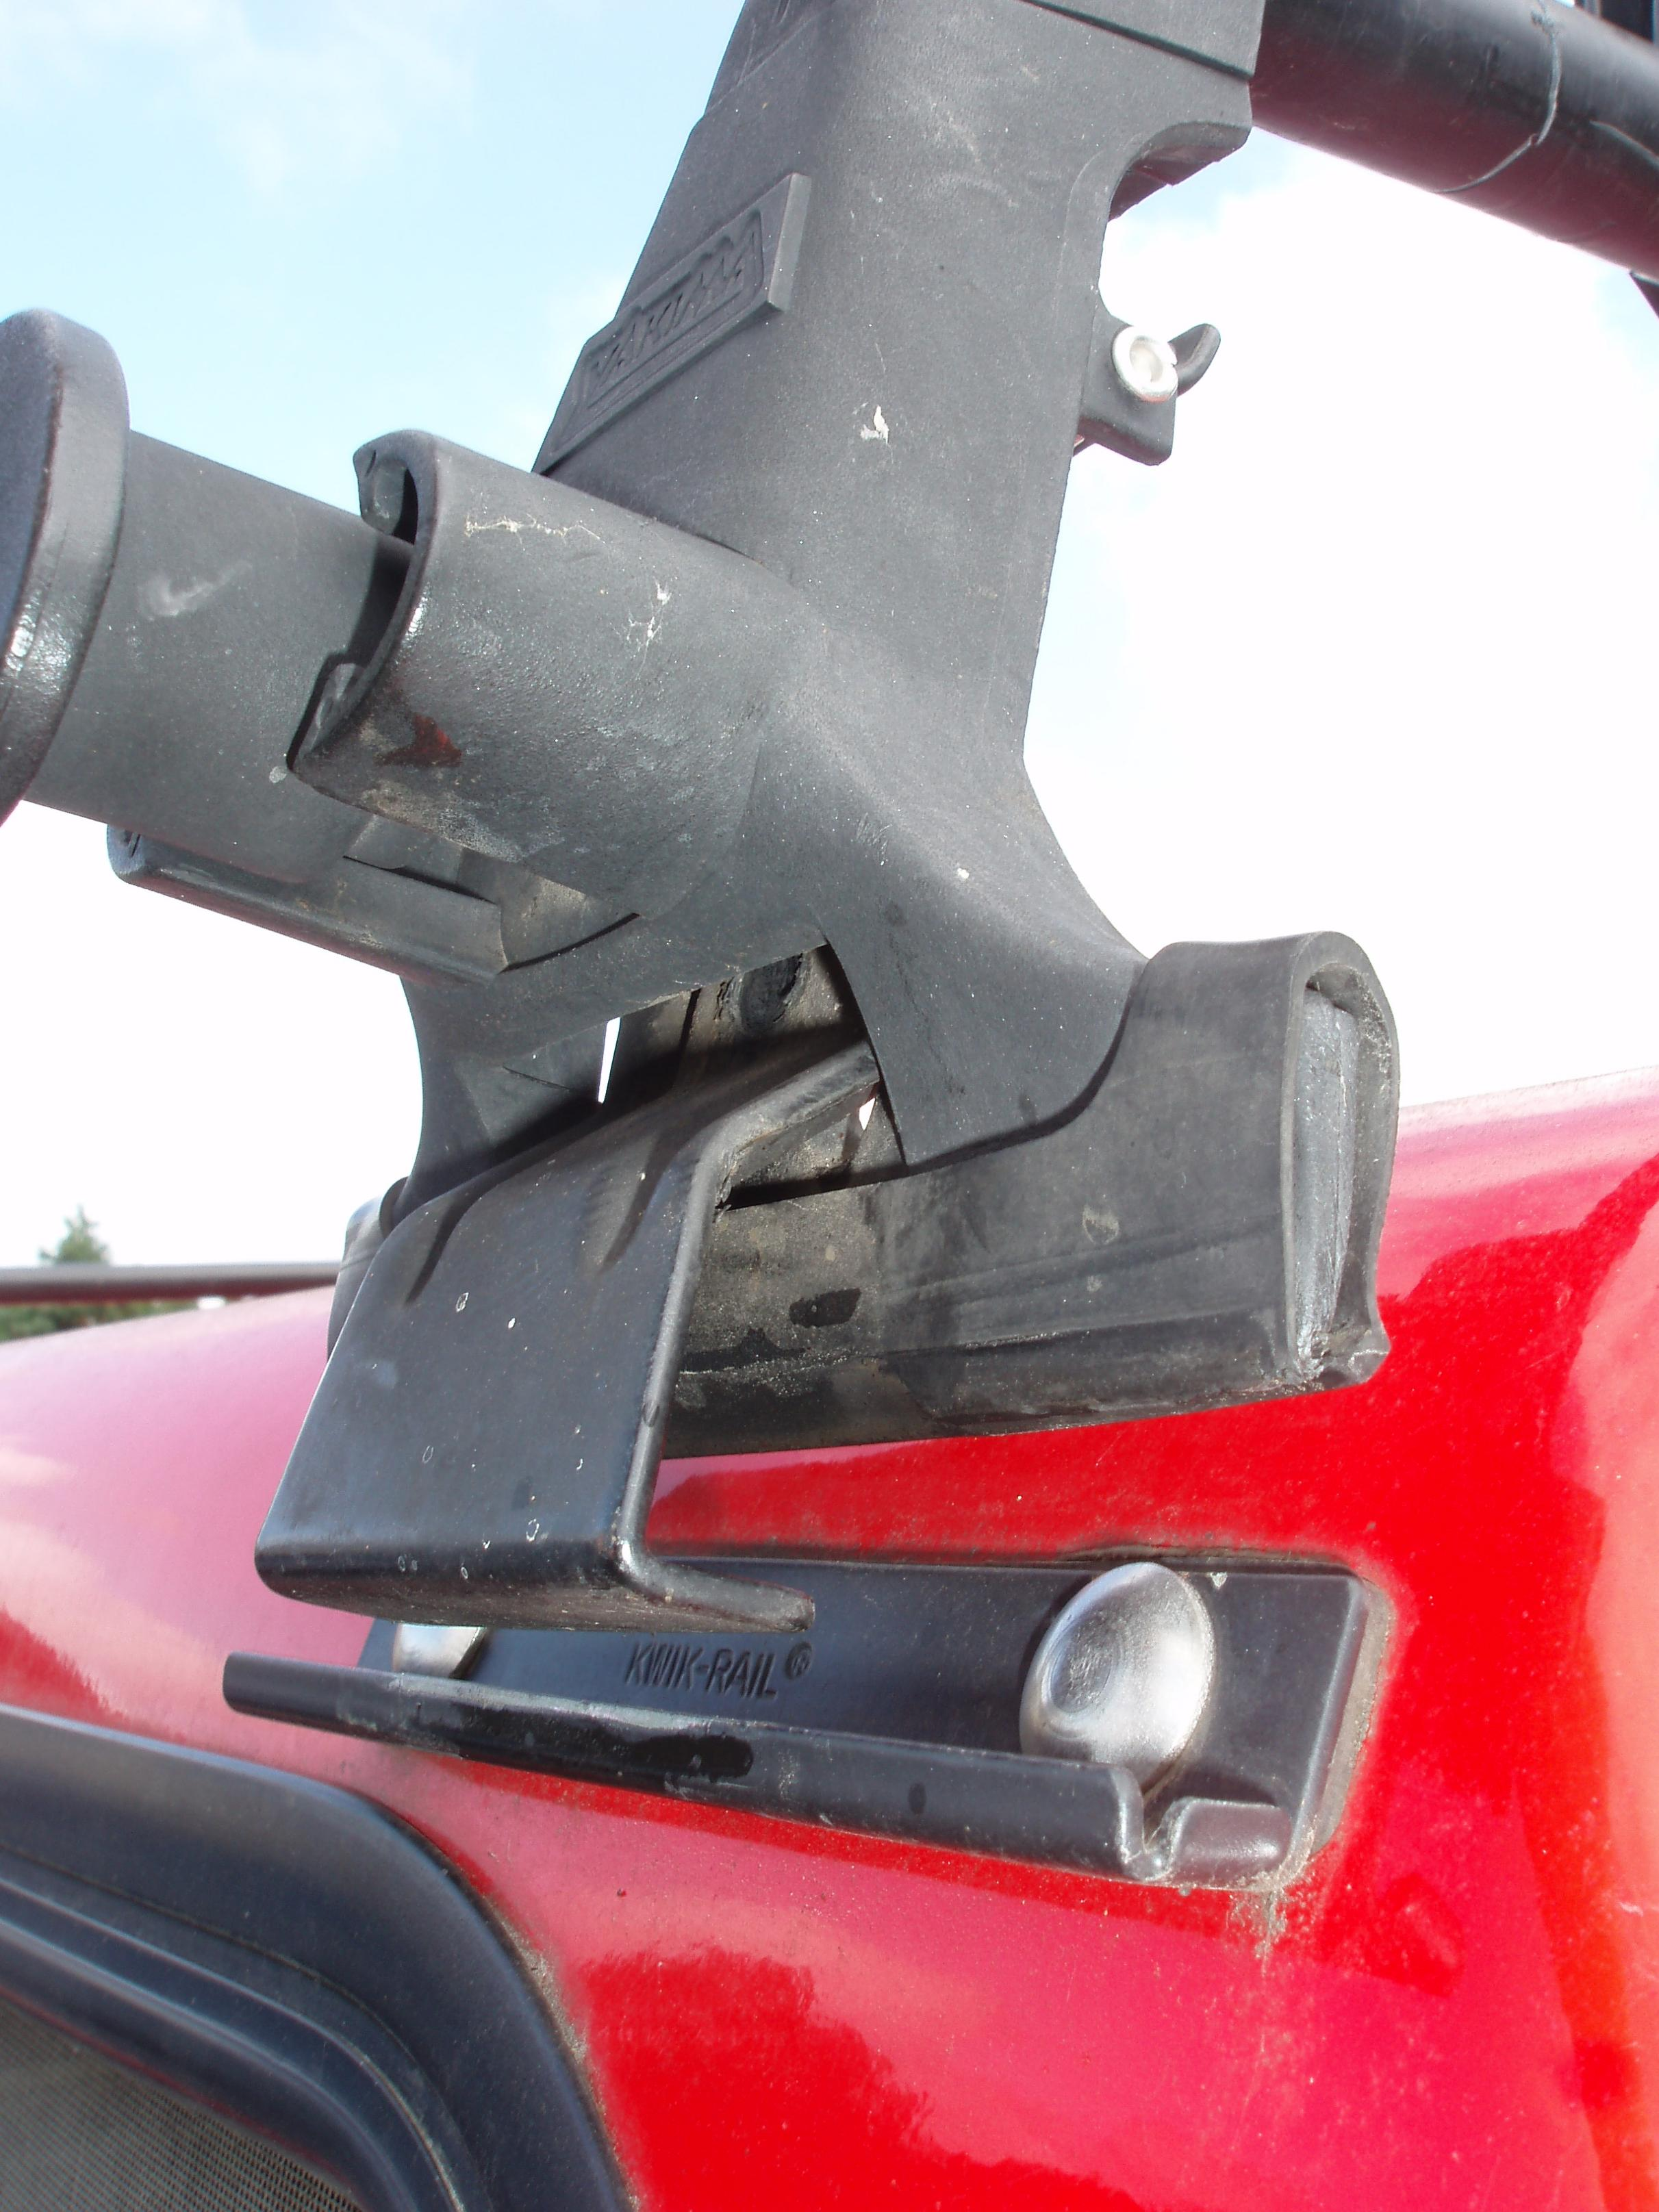 Bwca Canoe Rack Carrier For My Truck Boundary Waters Gear